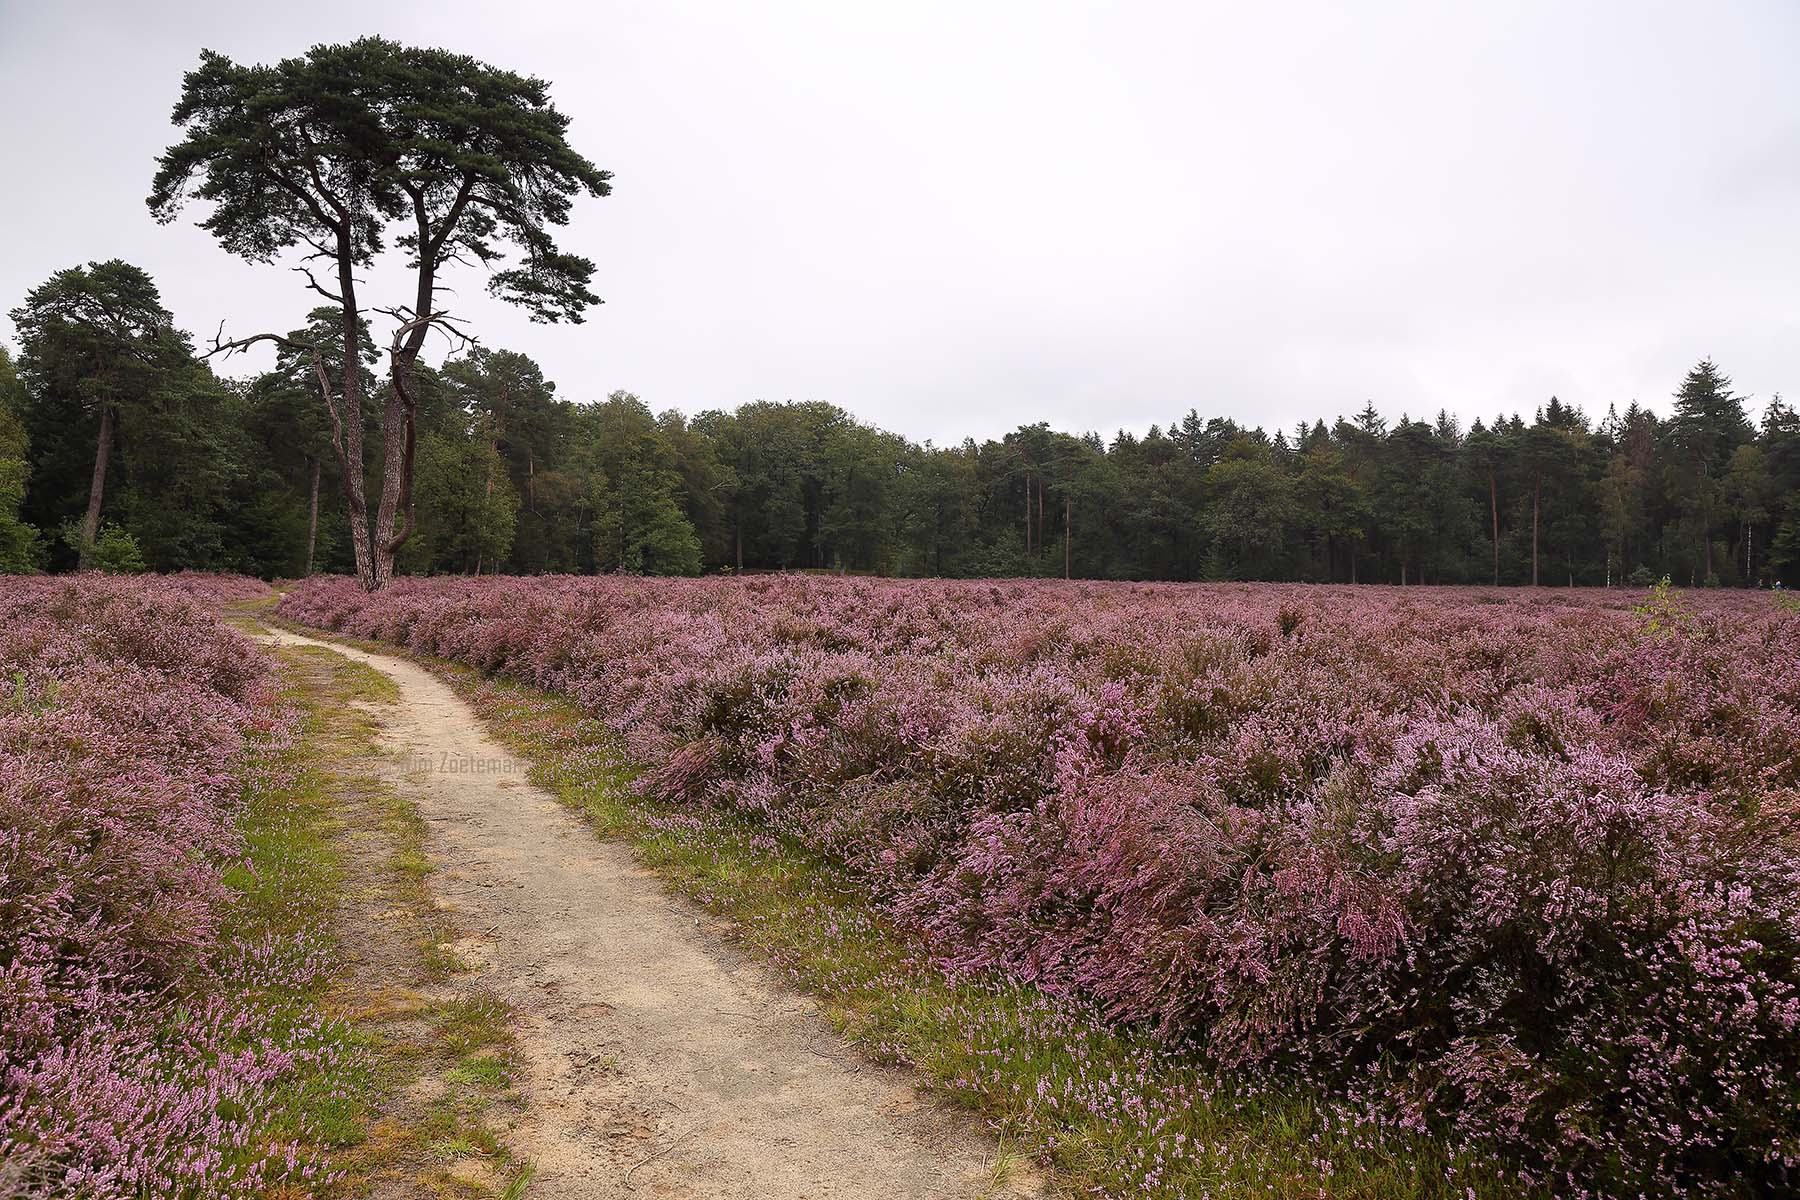 IMG_7753-Heide-Windmolenveld